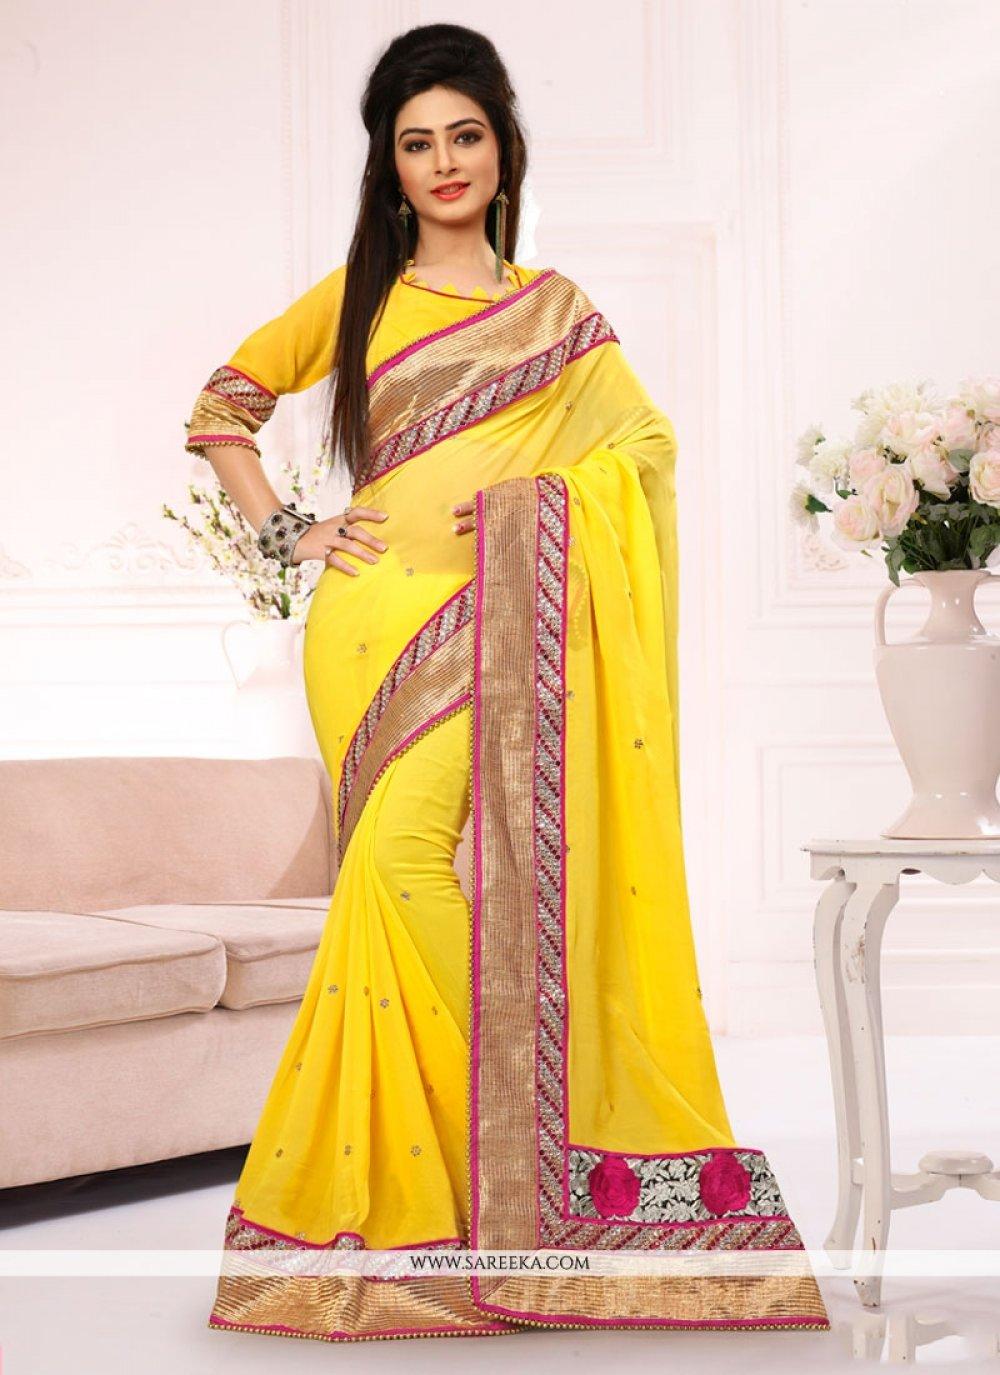 Talismanic Viscose Yellow Embroidered Work Designer Saree